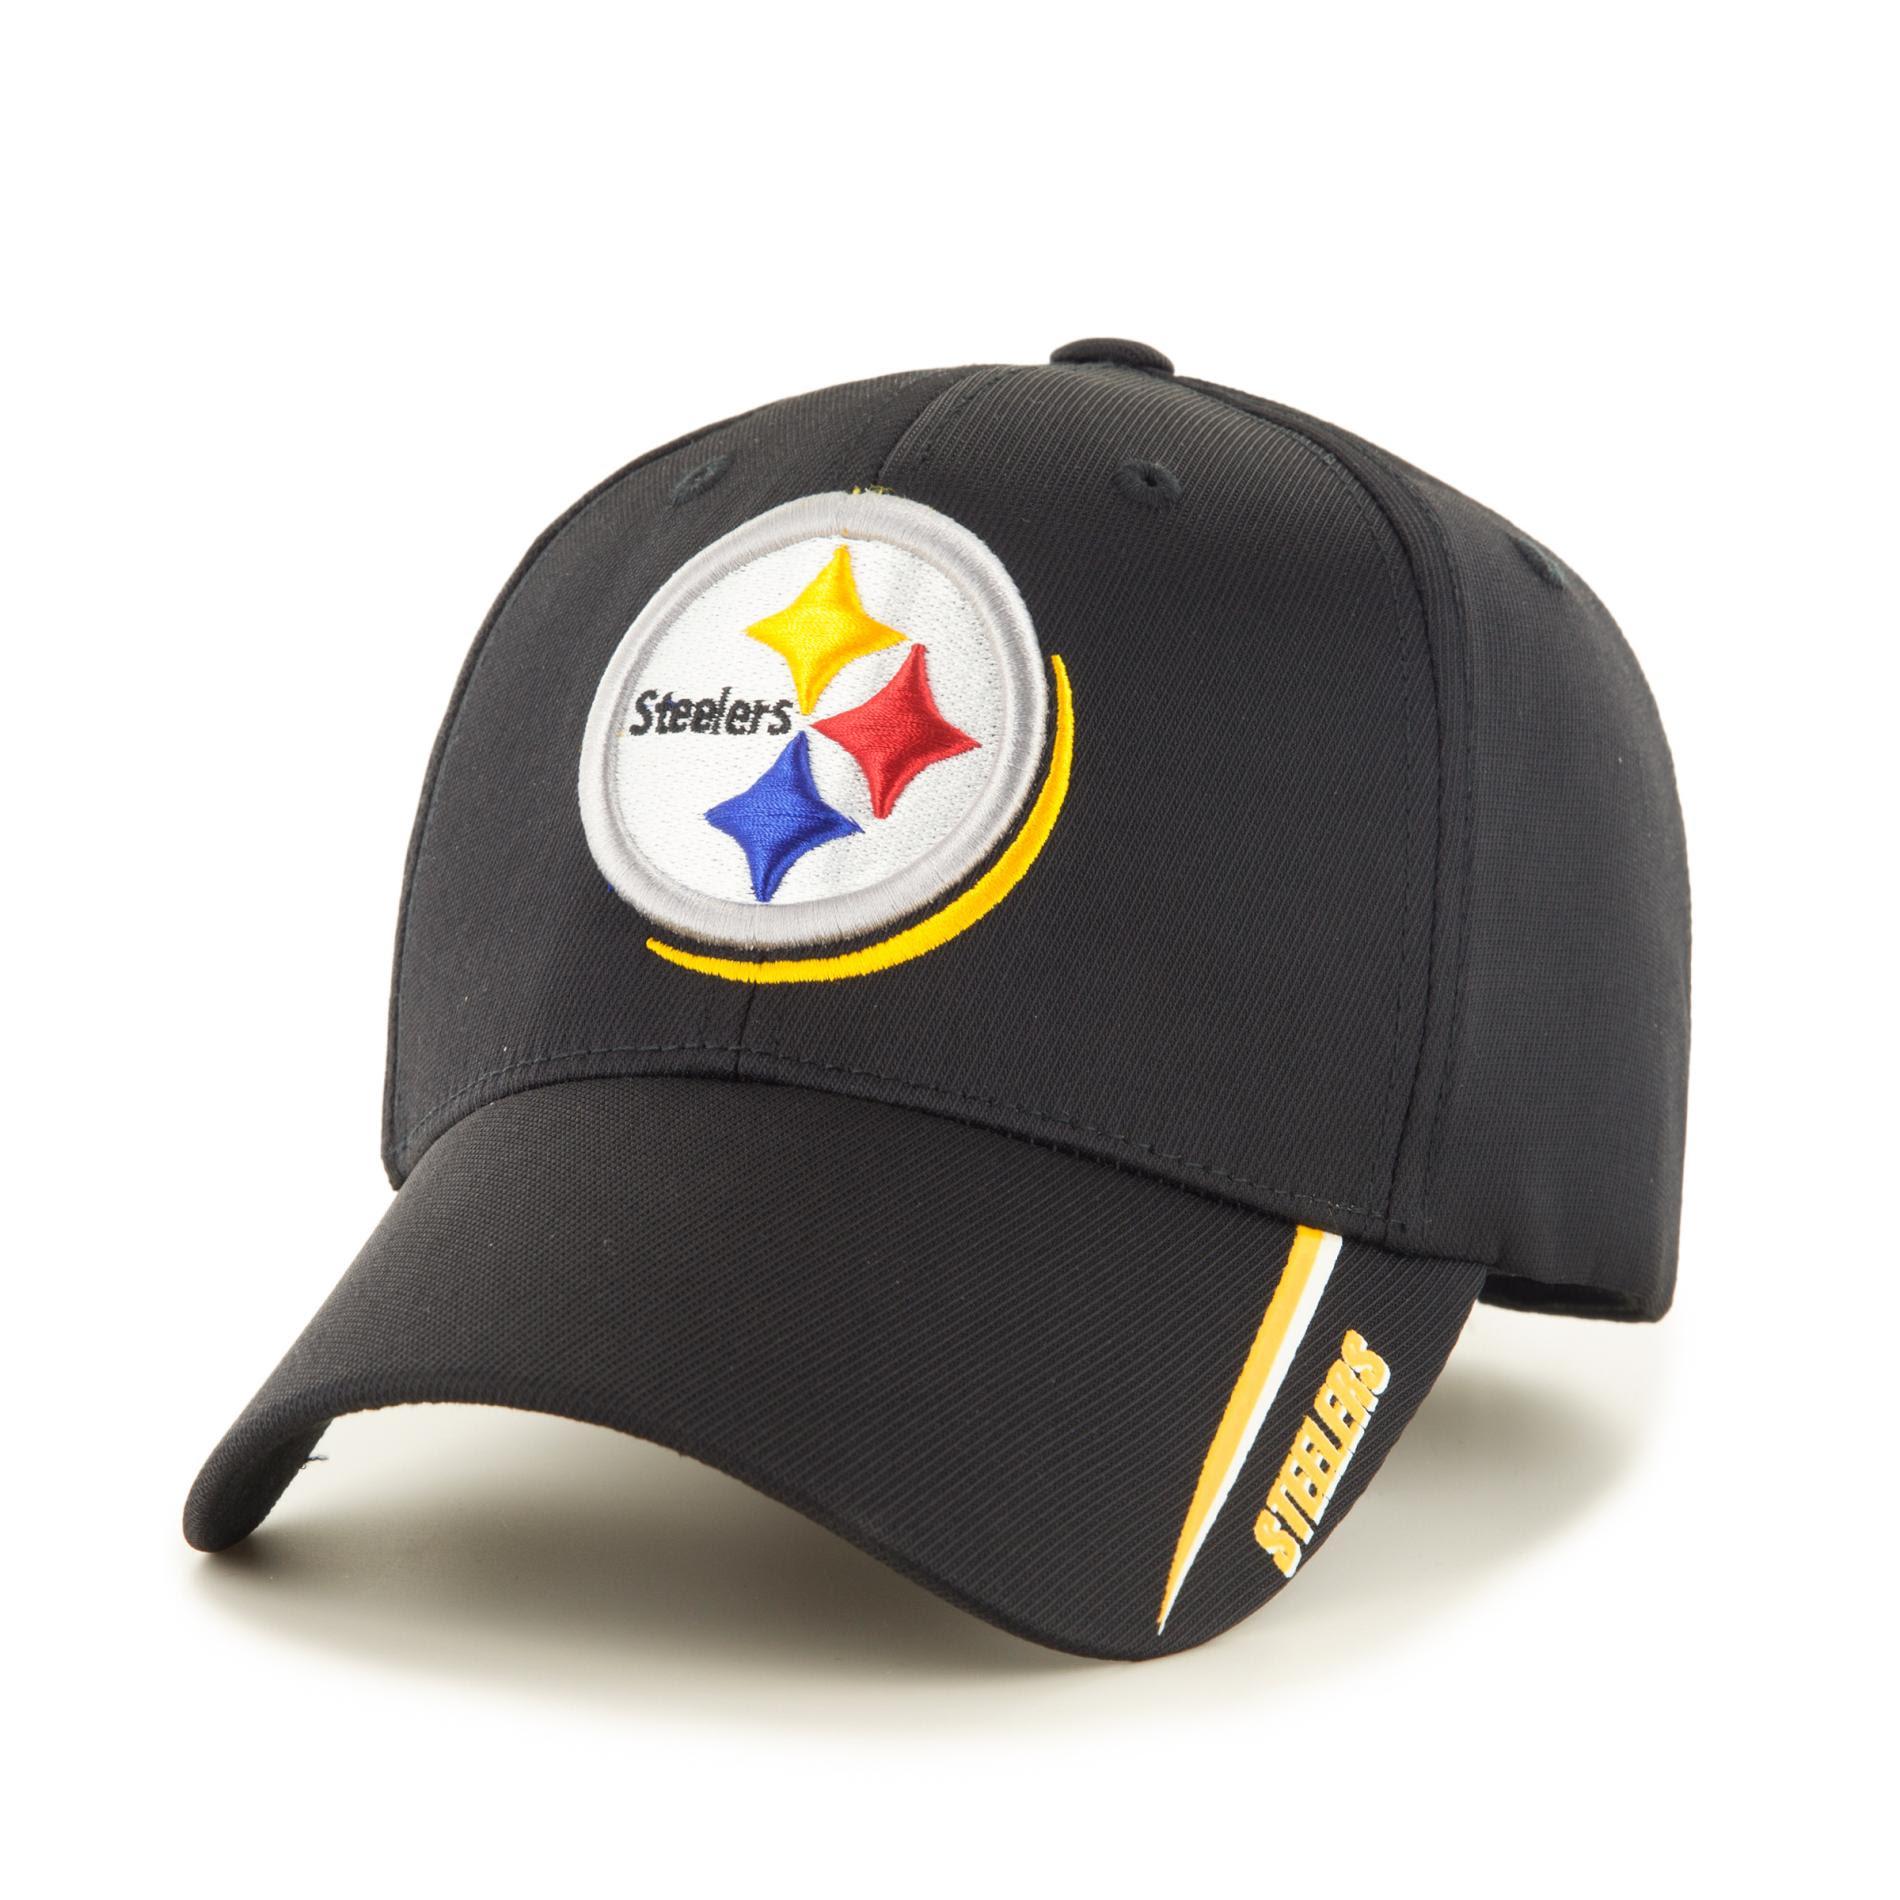 NFL Pittsburgh Steelers Mens Curved Brim Hat